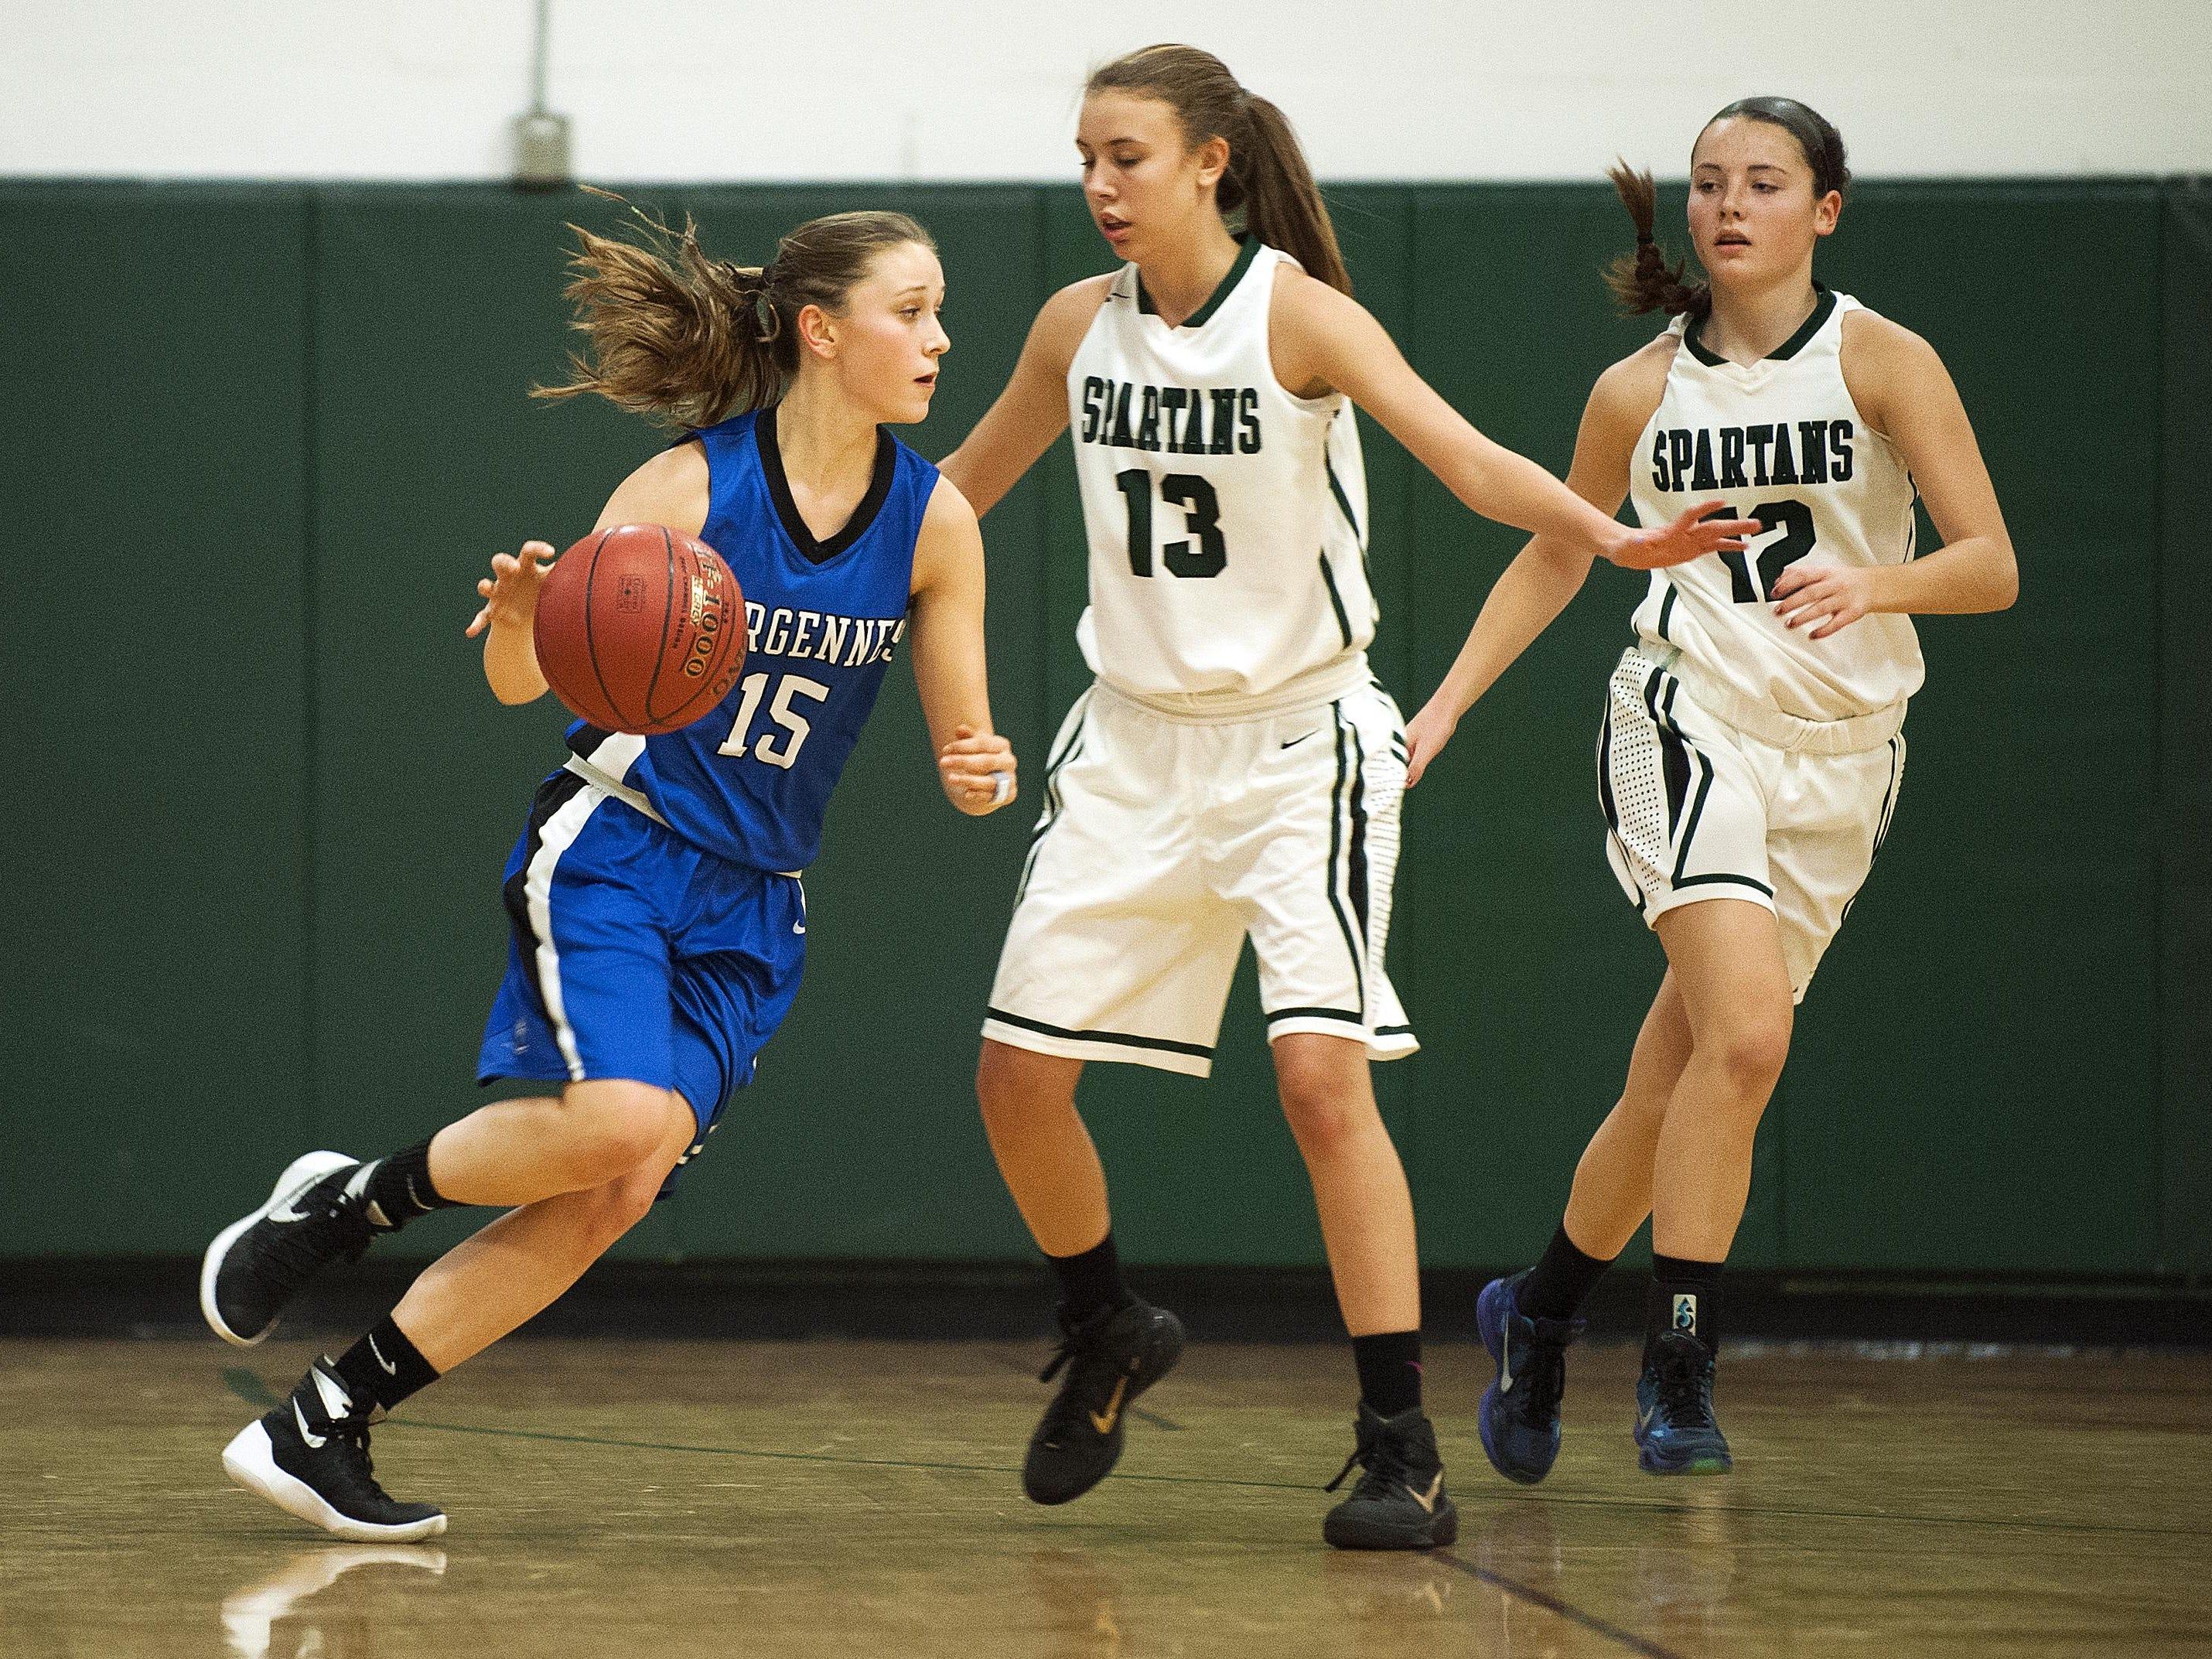 Vergennes' Caroline Johnston (15) tries to dribble then all around Winooski's Riley Corrigan (13) during the girls basketball game at Winooski High School on Wednesday night.